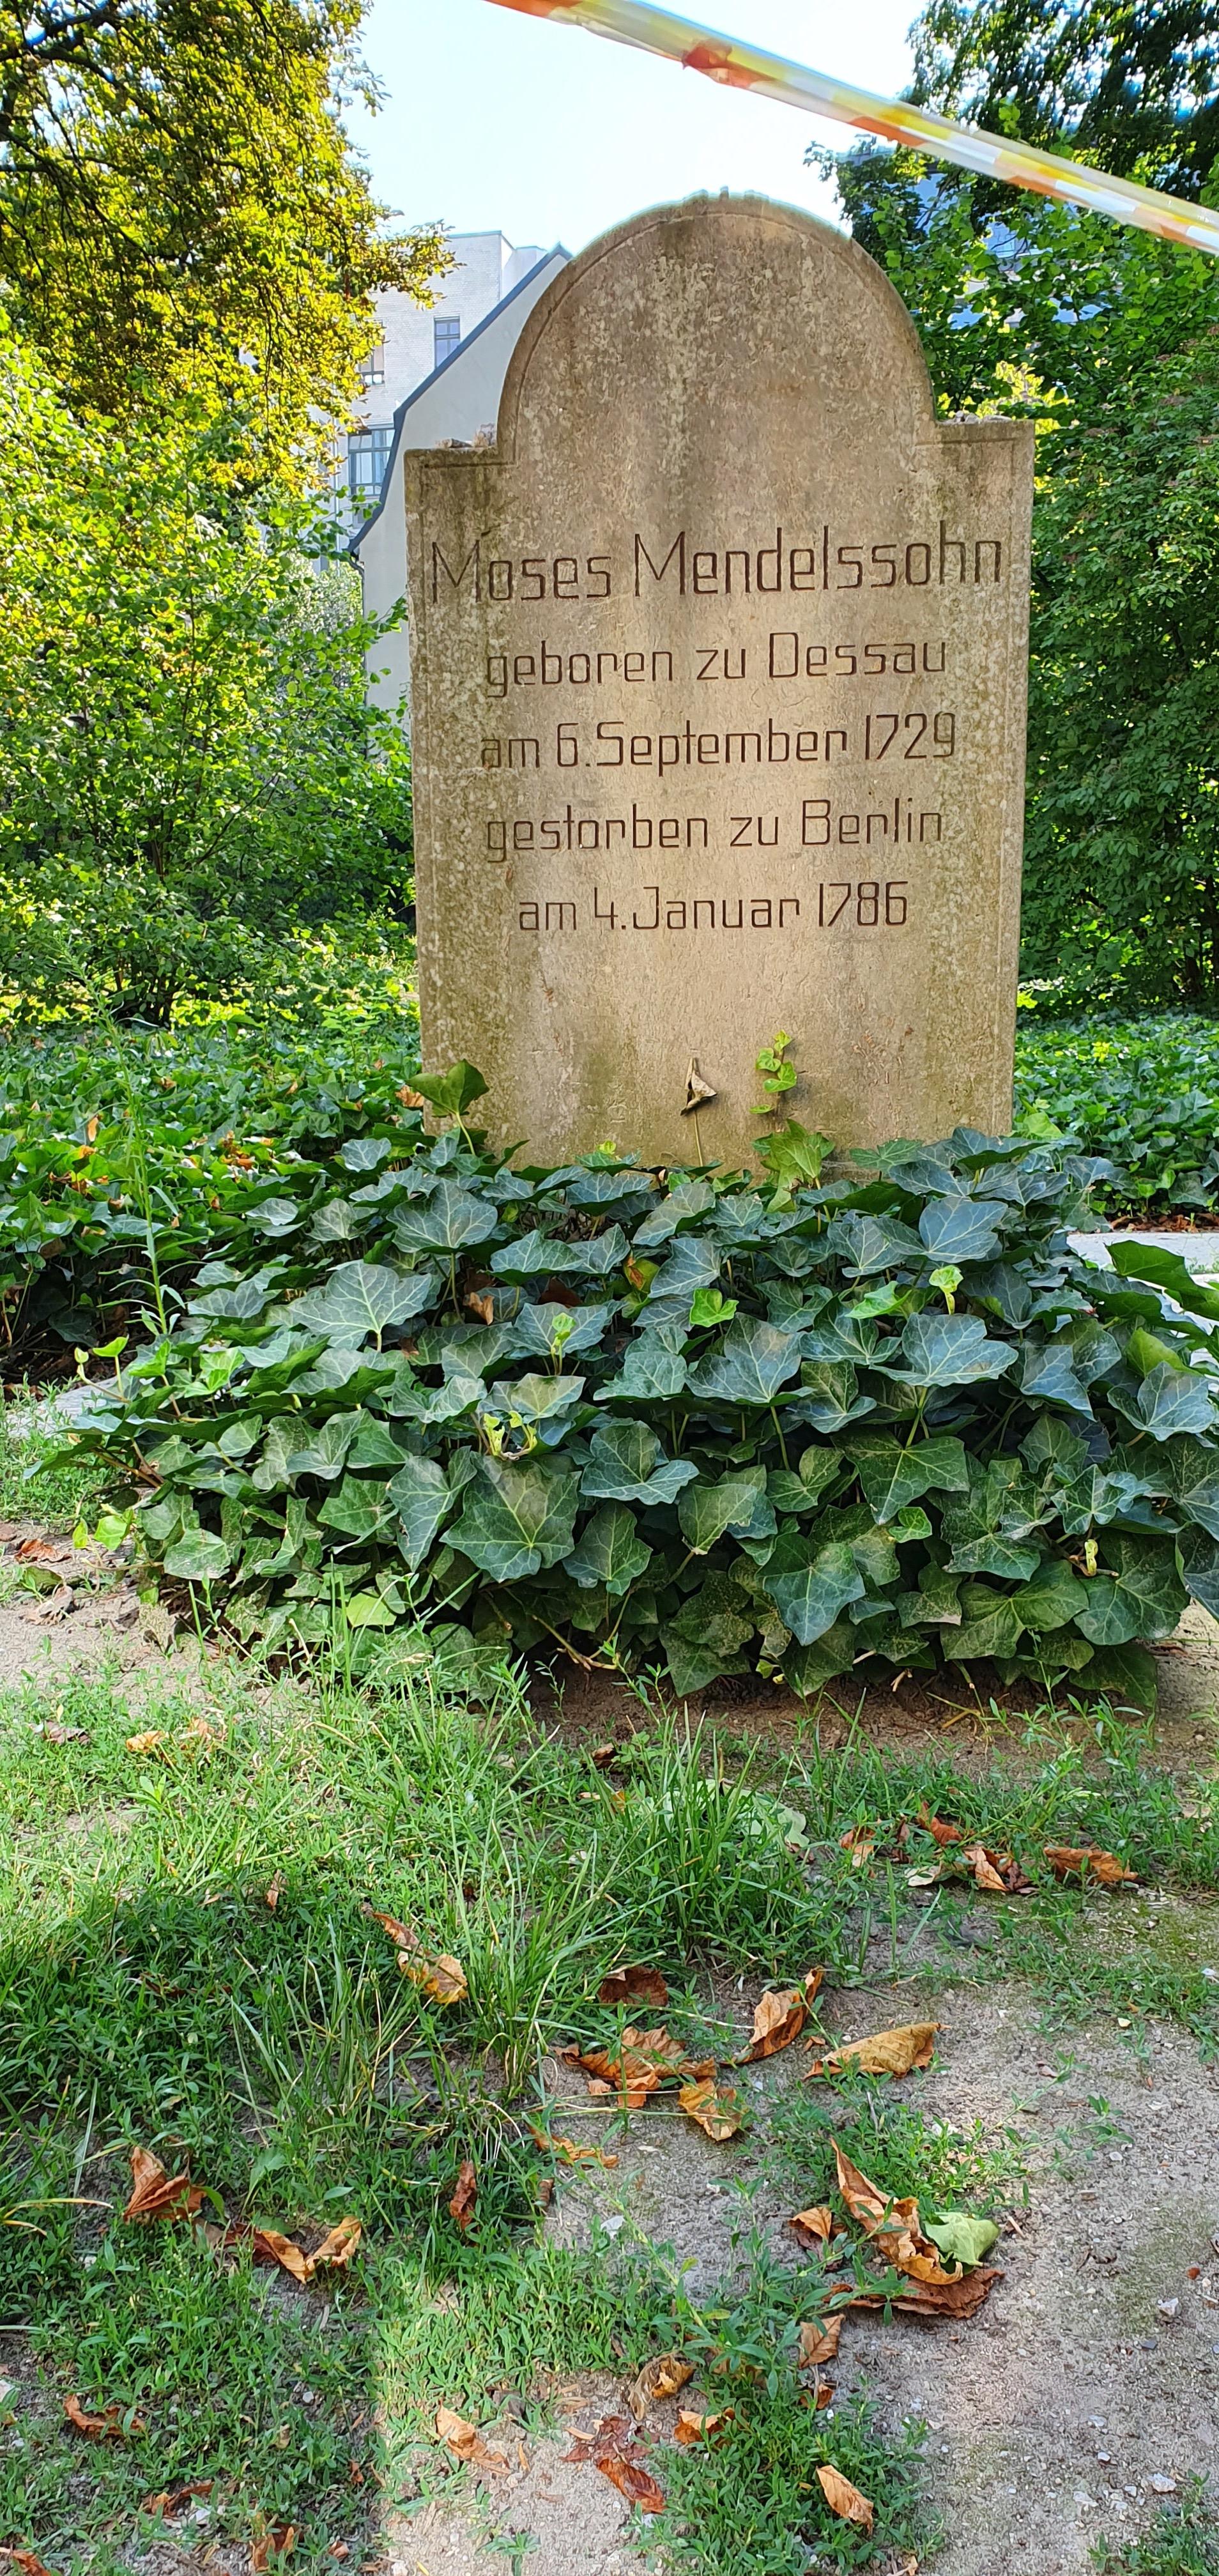 File:Grave of Moses Mendelssohn-Jewish cemetery Berlin.jpg